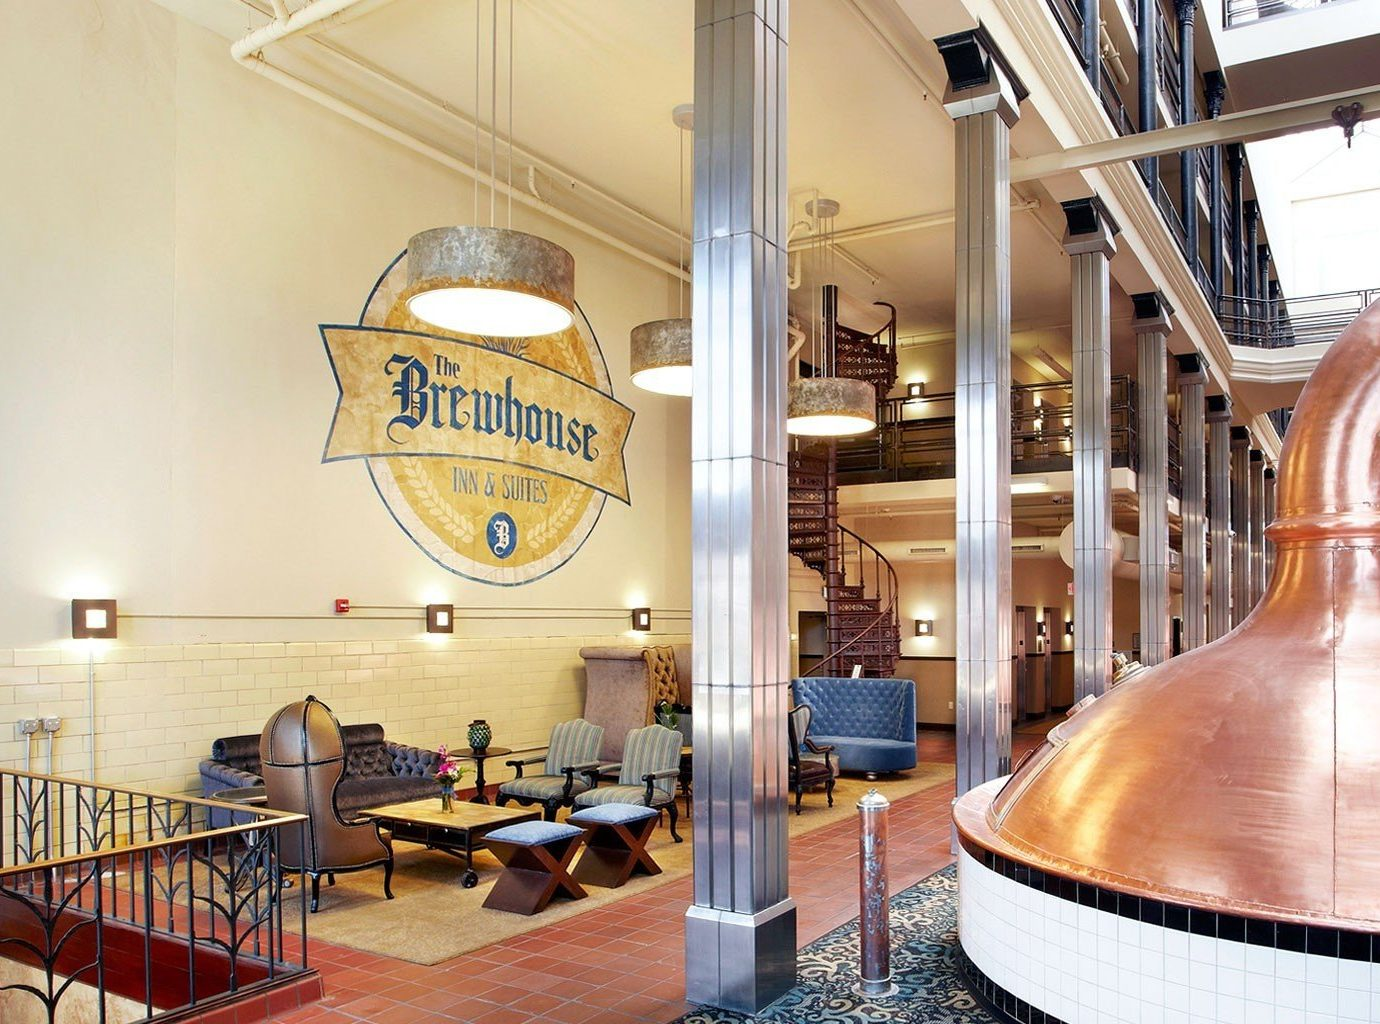 Food + Drink indoor chair building restaurant interior design tourist attraction Lobby furniture